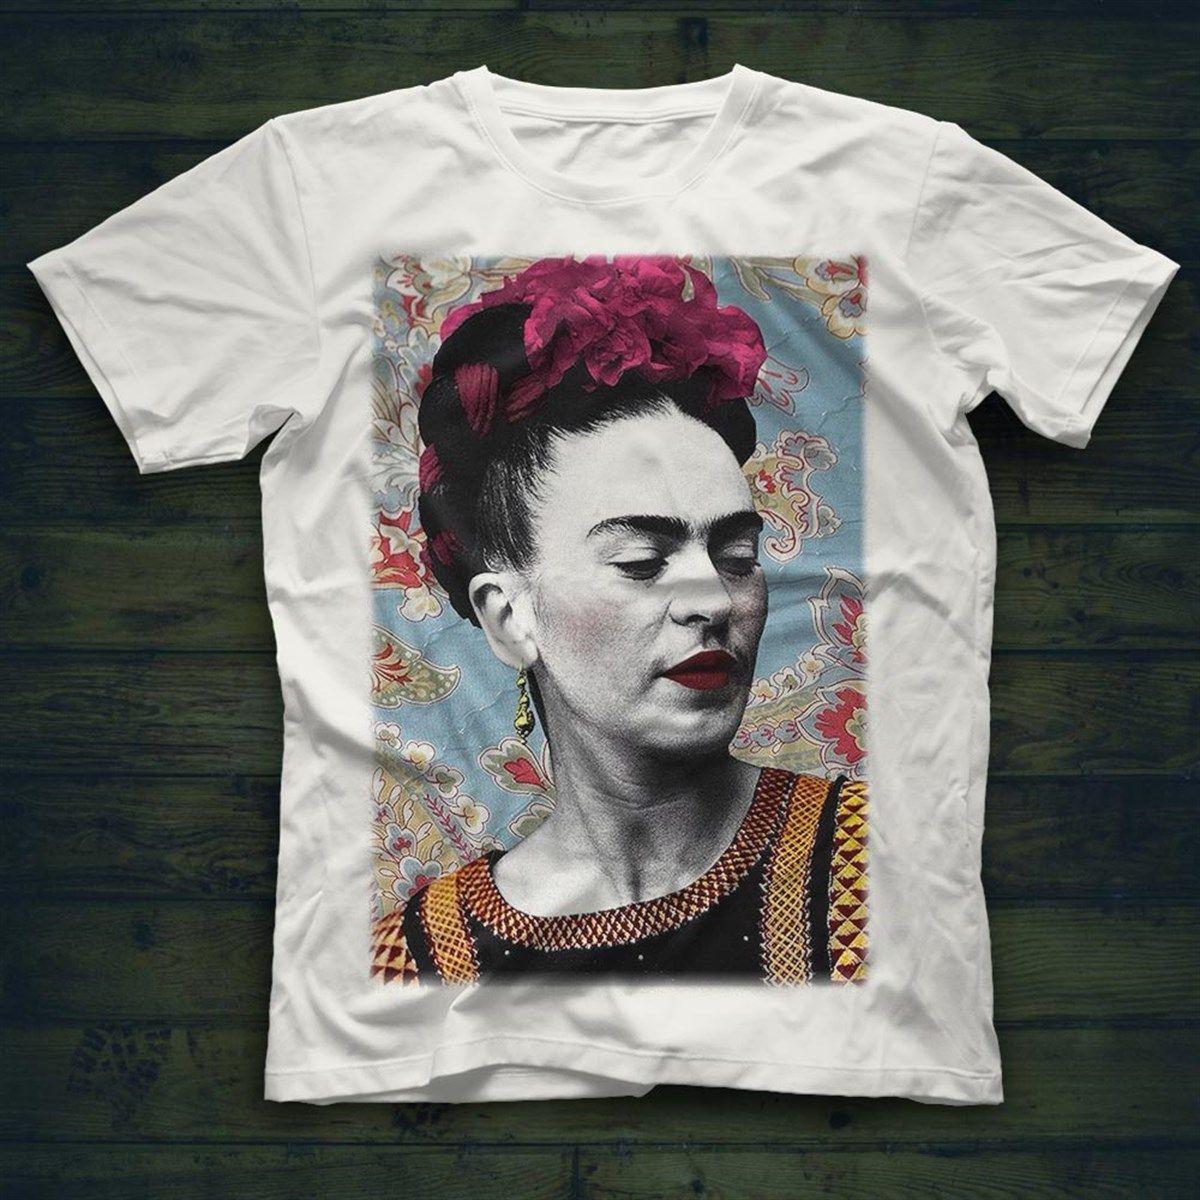 Unisex T-Shirt Frida Kahlo Shirts For Men Women White T Shirts